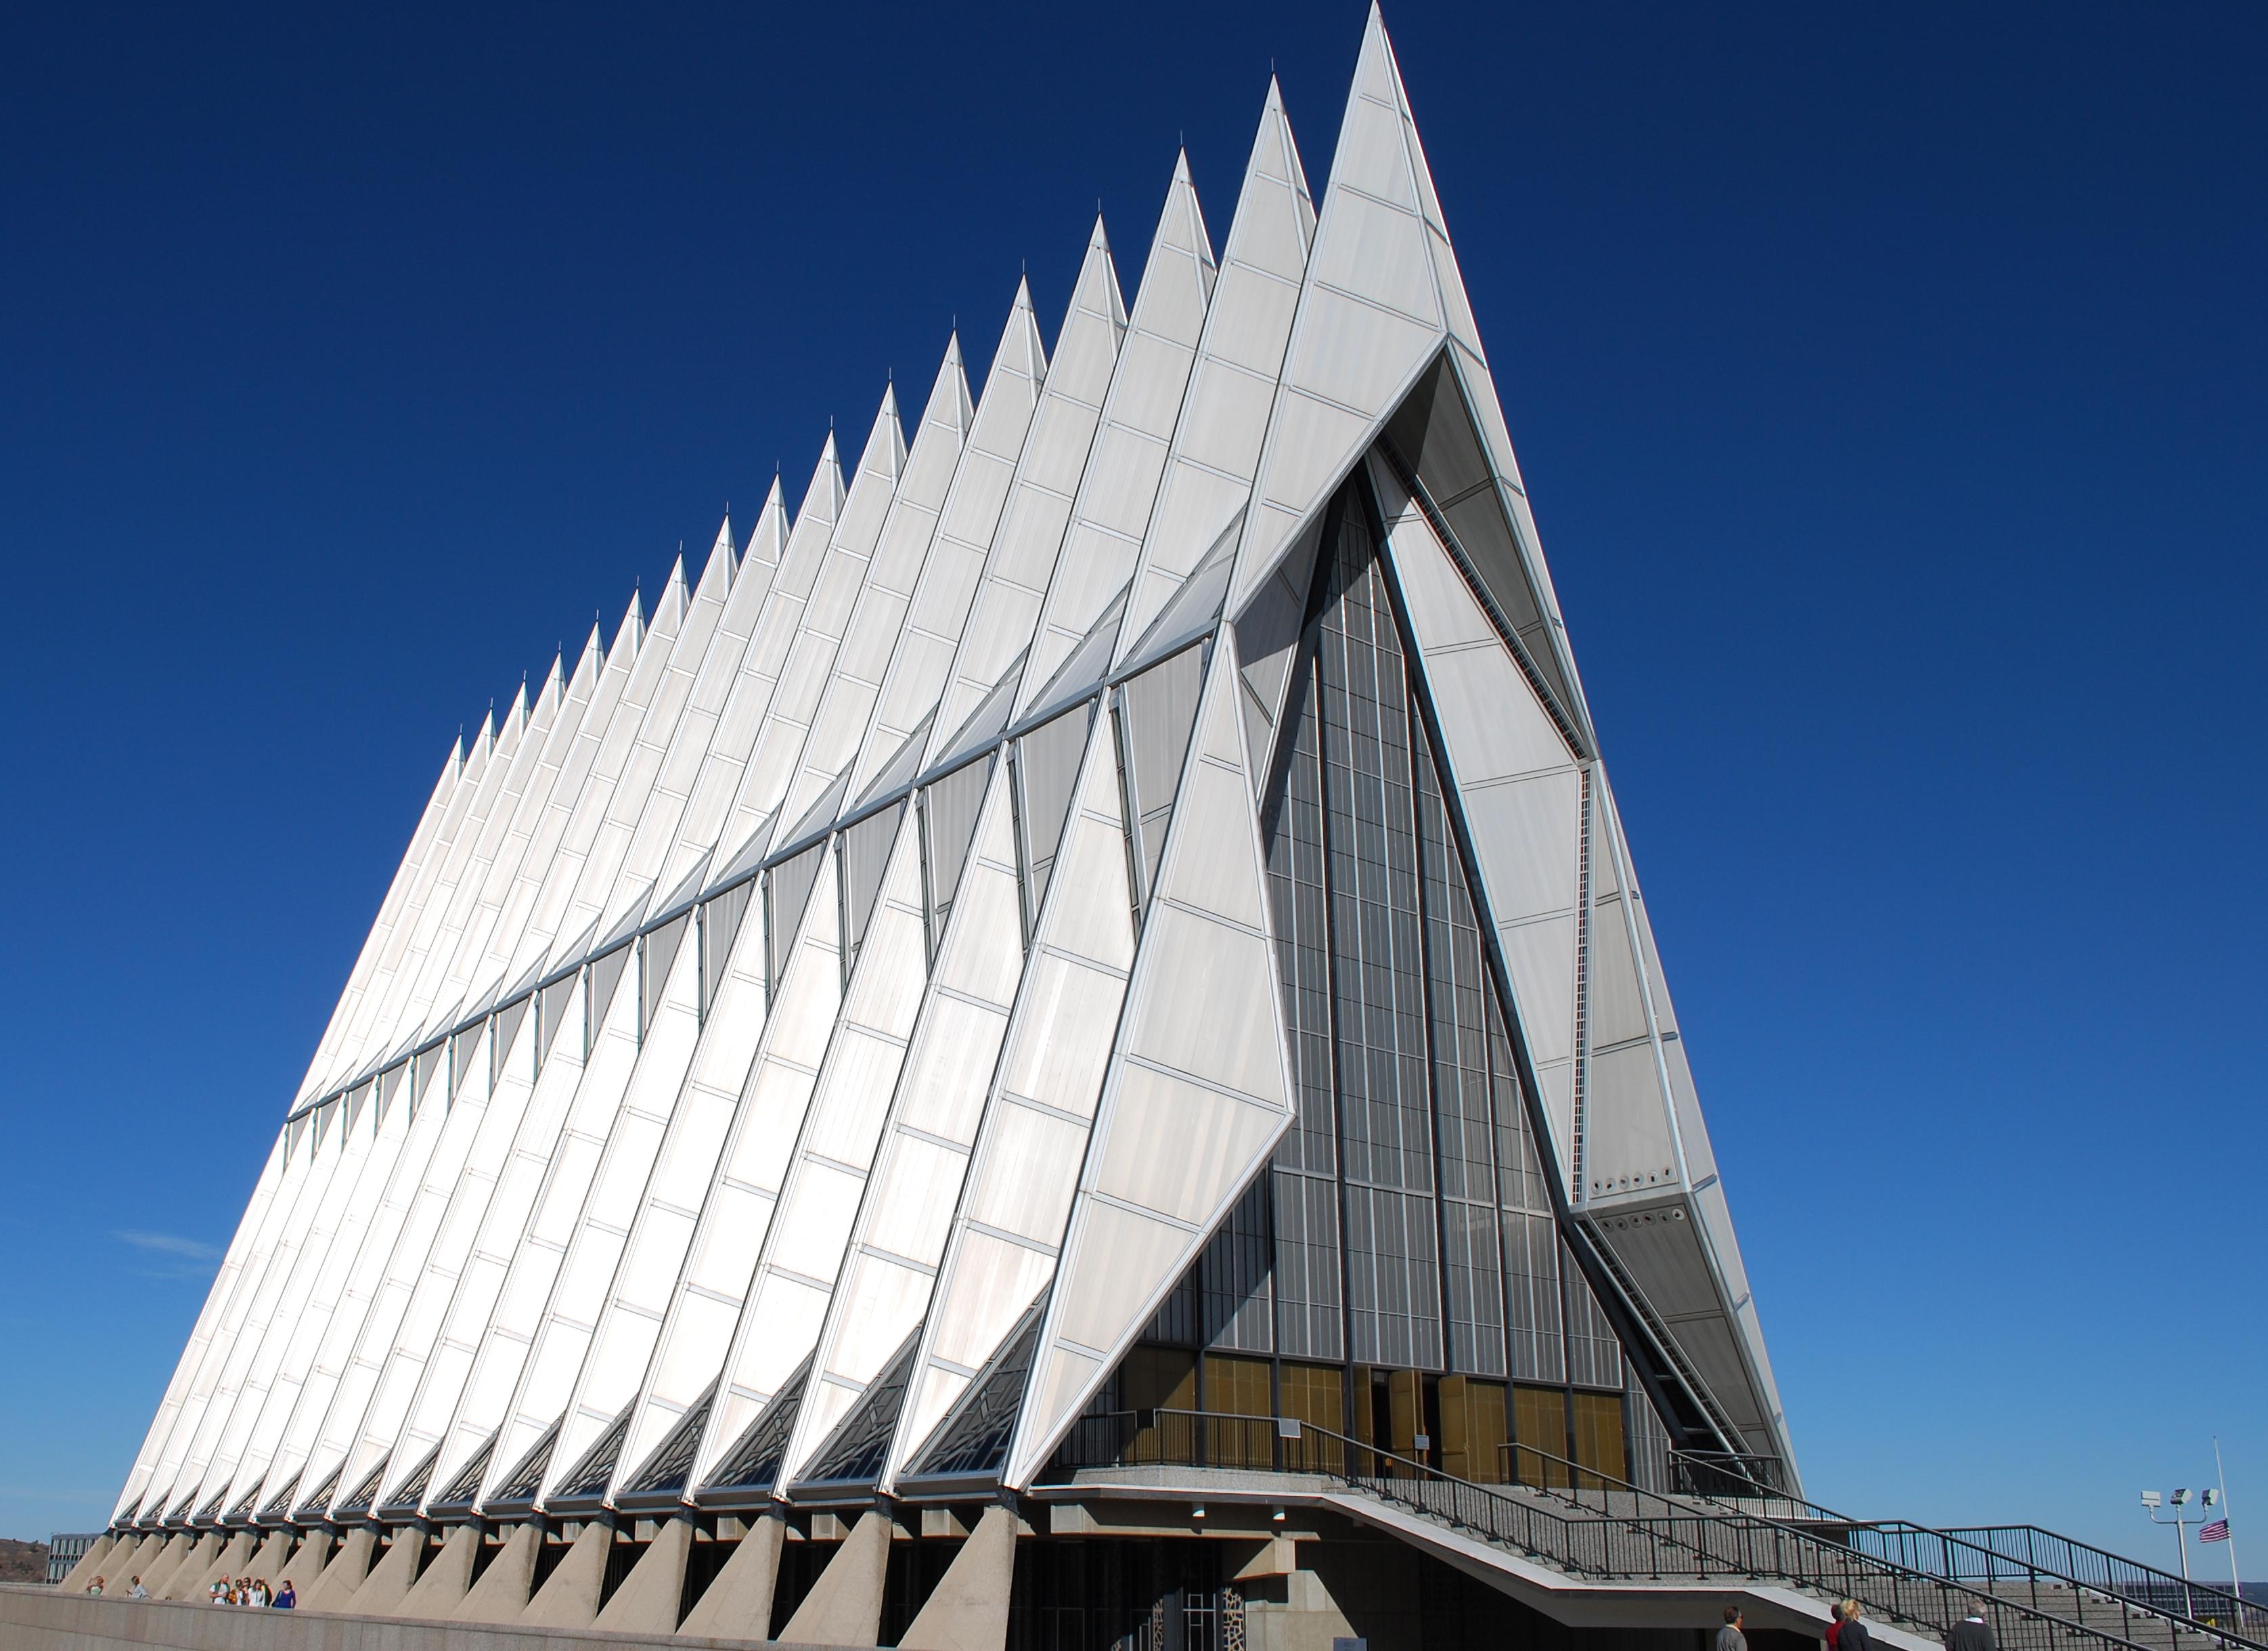 File:US Air Force Academy Chapel.JPG - Wikipedia